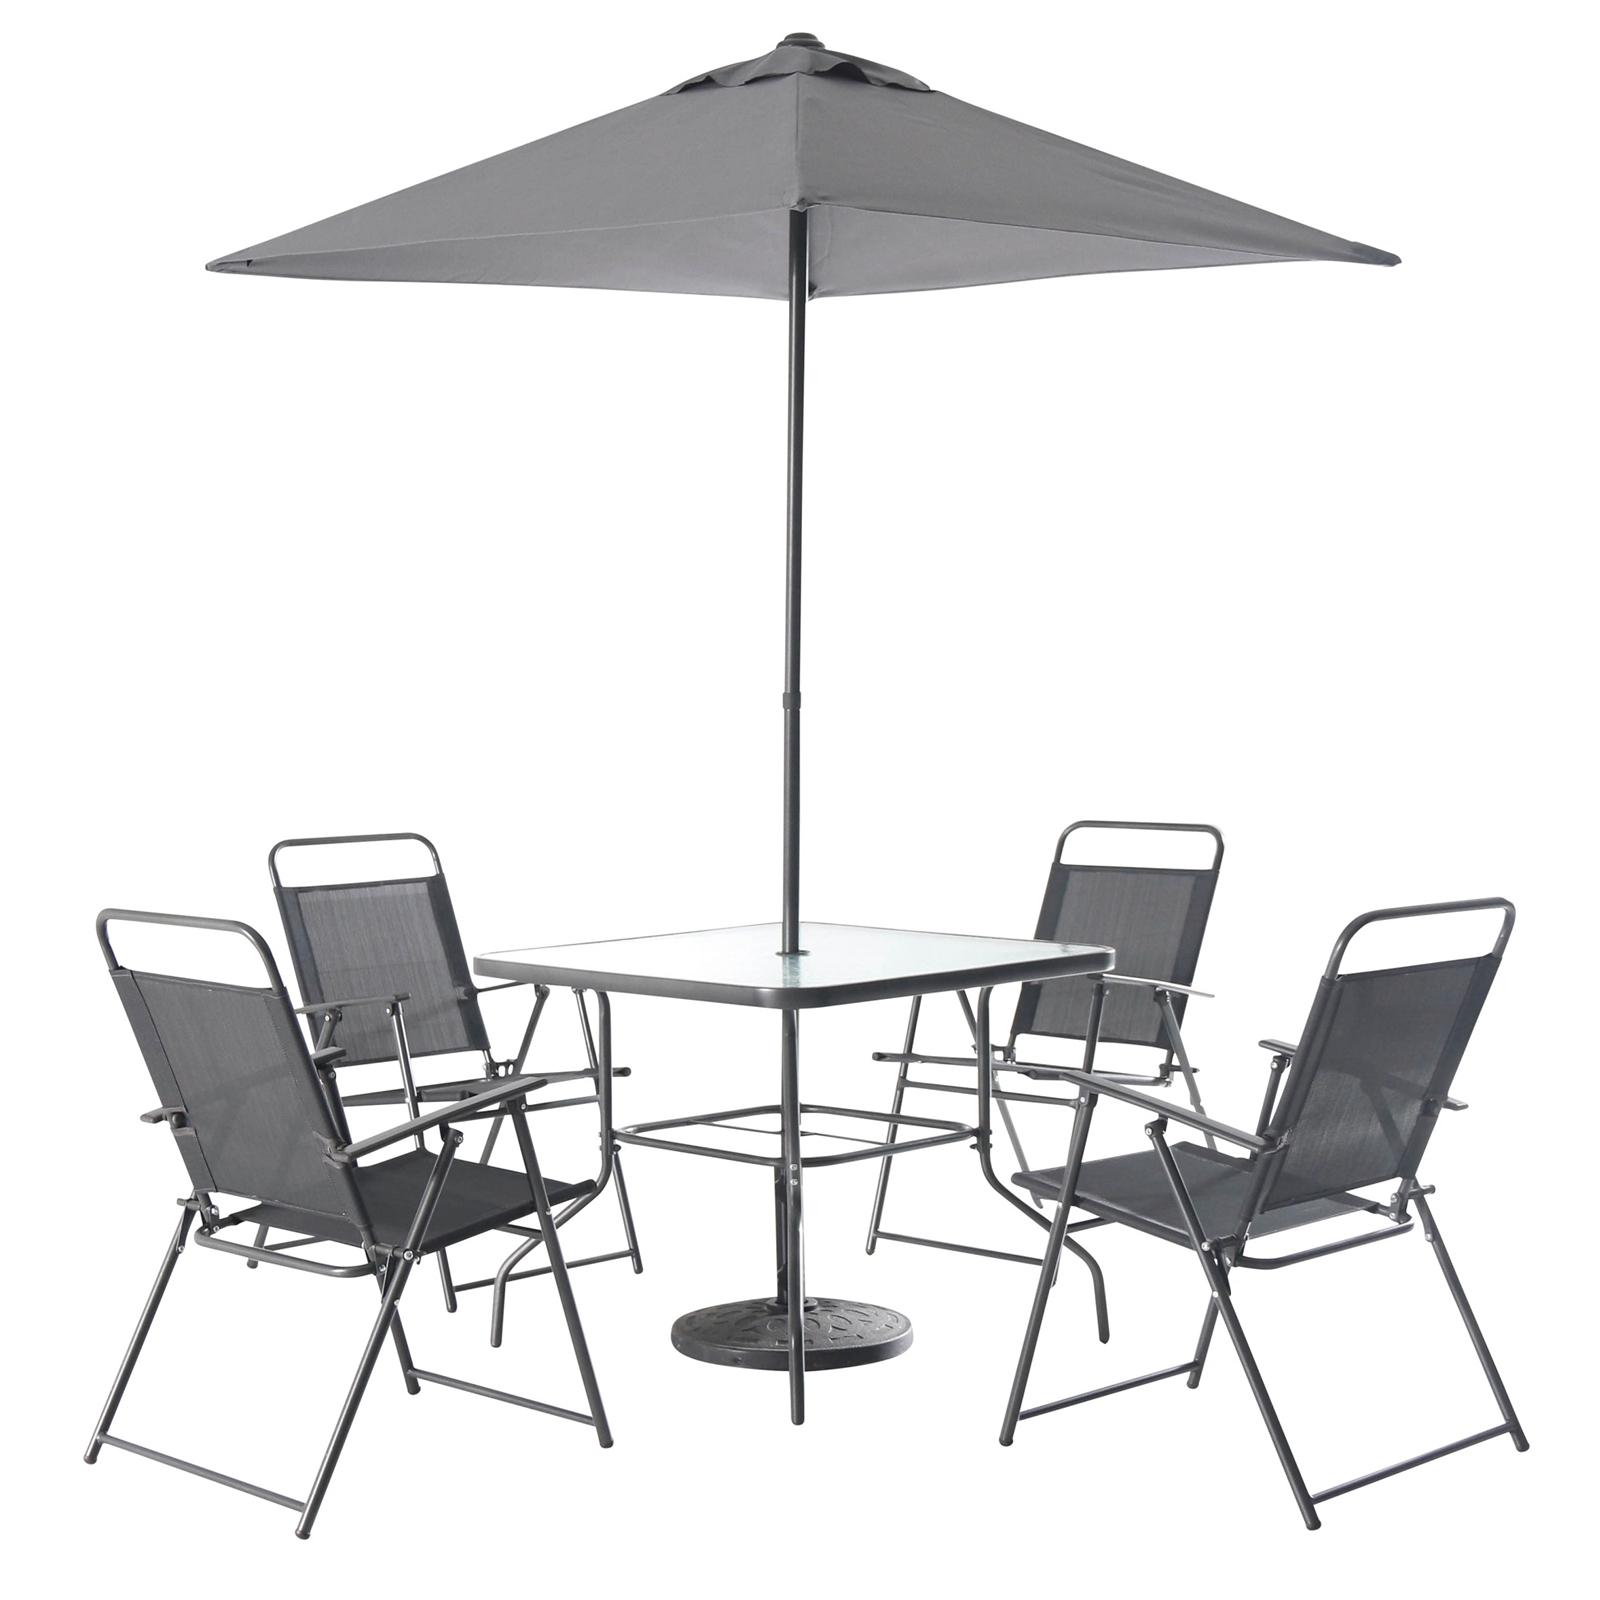 Quebec Steel 4 Seater Square Garden Furniture Set - Dark Grey for £58.50 Free C&C @ HomeBase